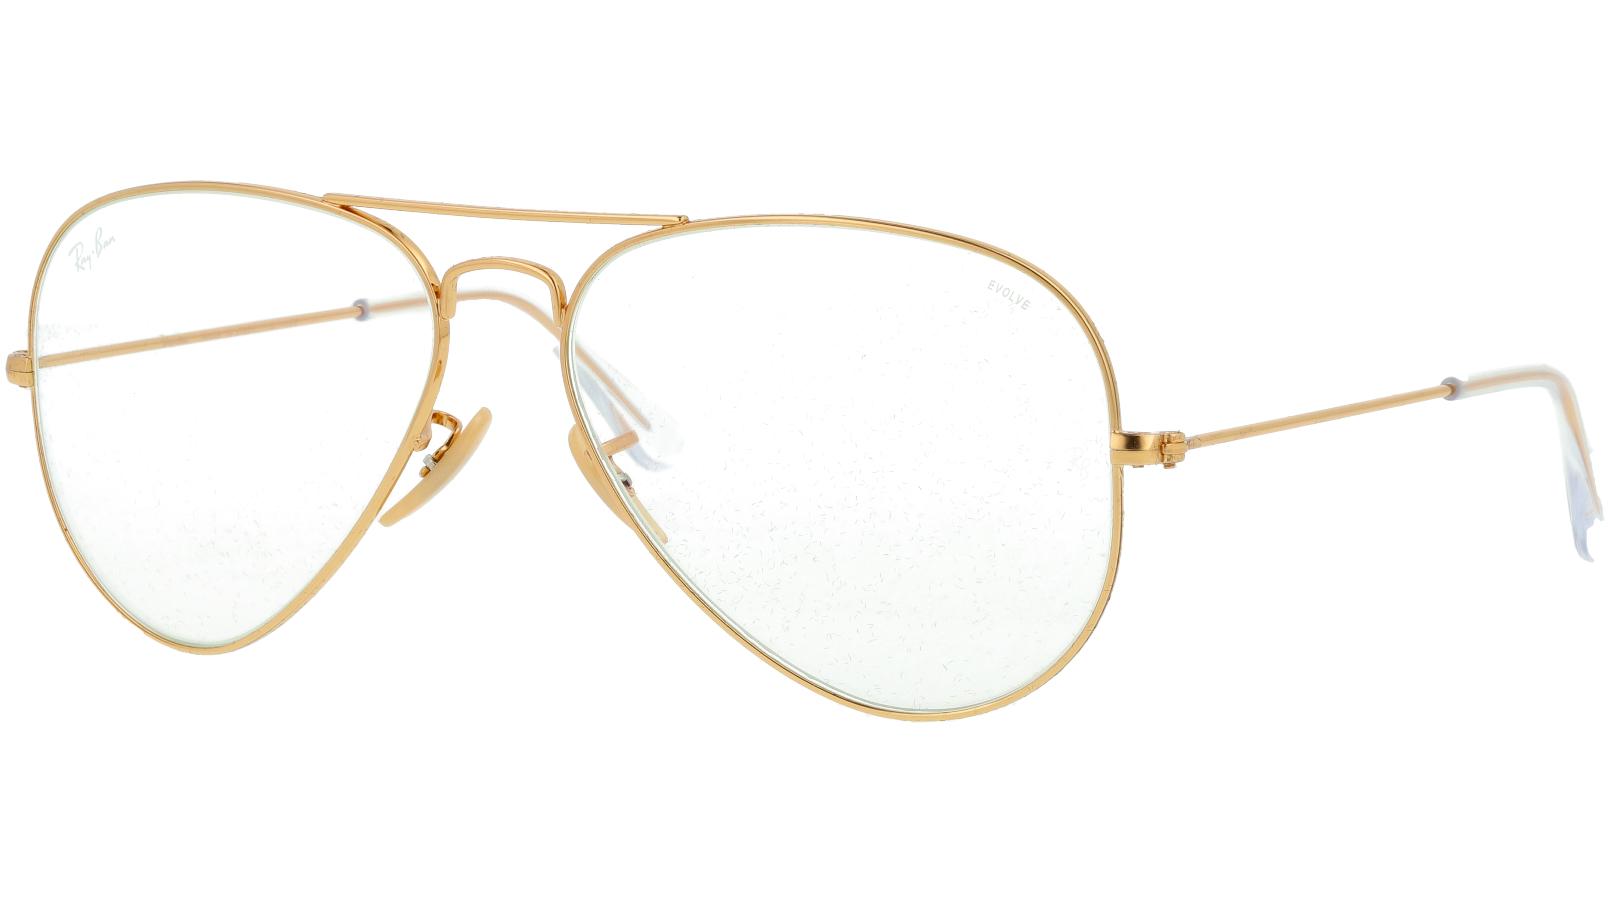 Ray-Ban RB3025 001/5F 58 Arista Pilot Sunglasses